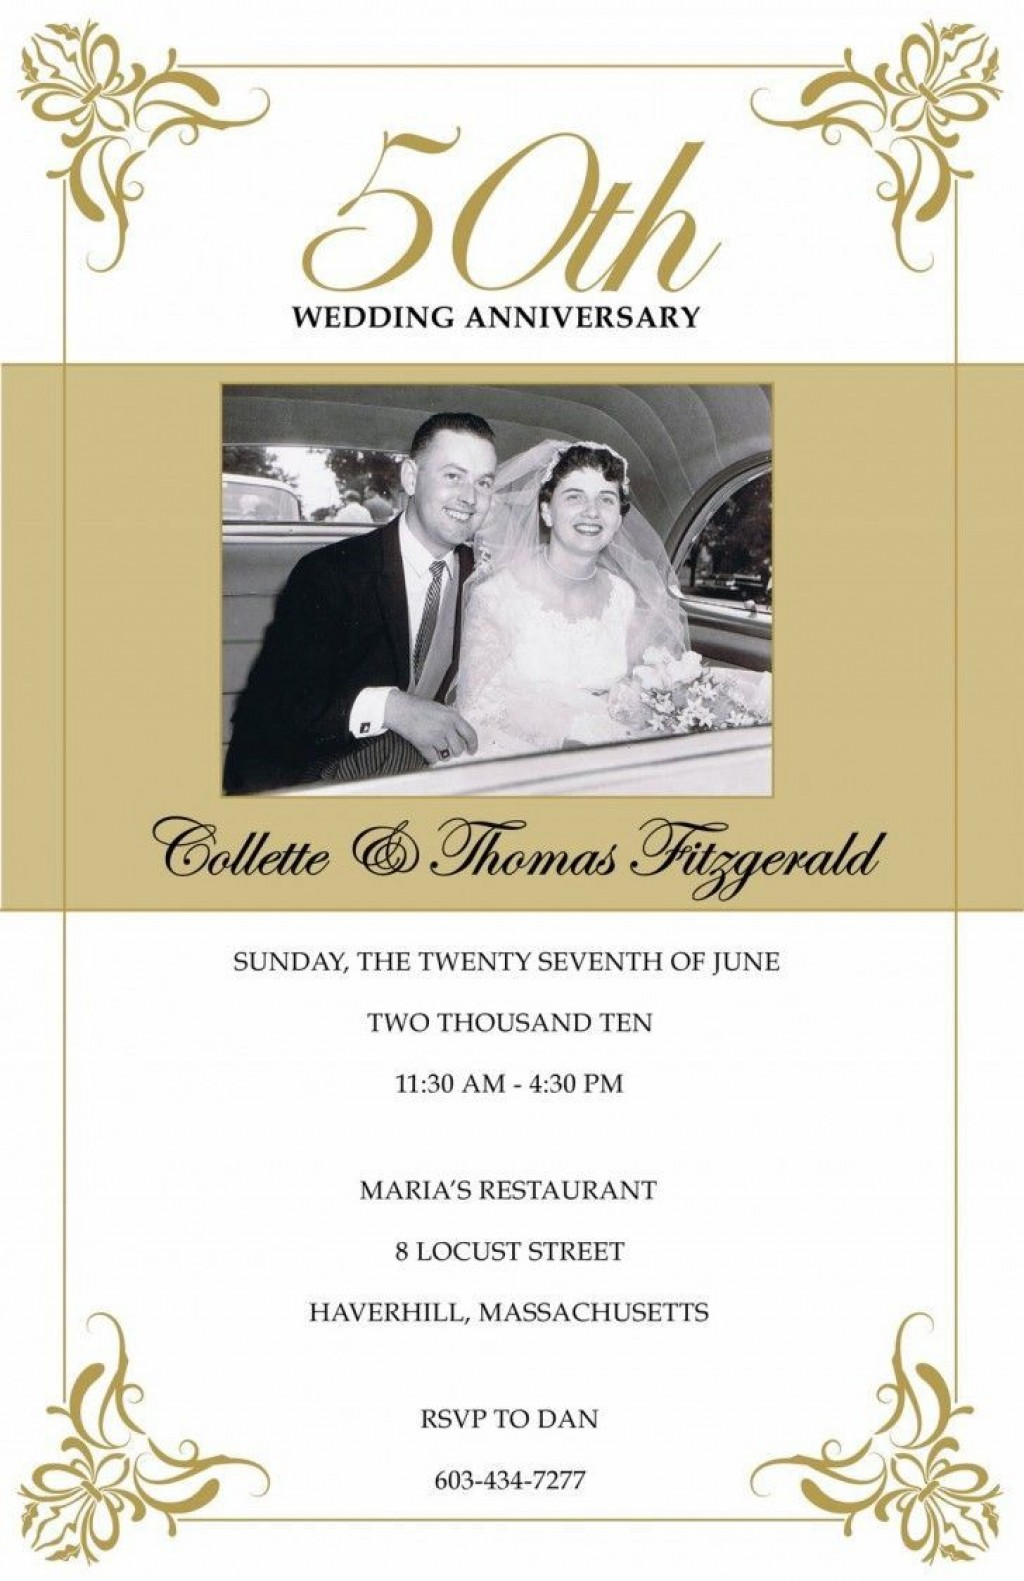 006 Stunning 50th Wedding Anniversary Invitation Template Highest Quality  Templates Card Sample GoldenLarge